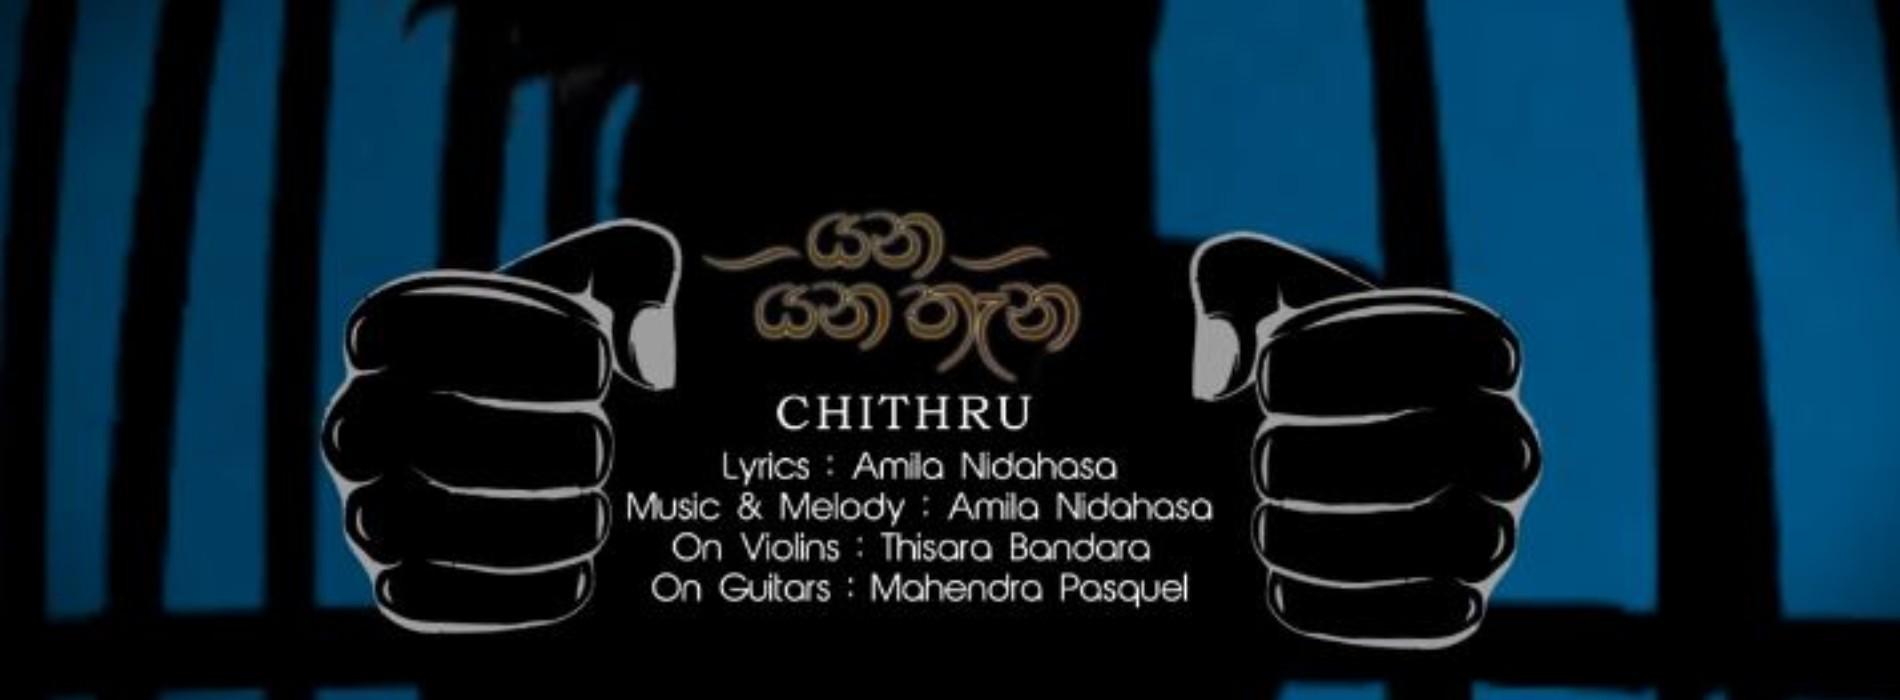 CHITHRU – Yana Yana Thena (යන යන තැන) Official Lyric Video